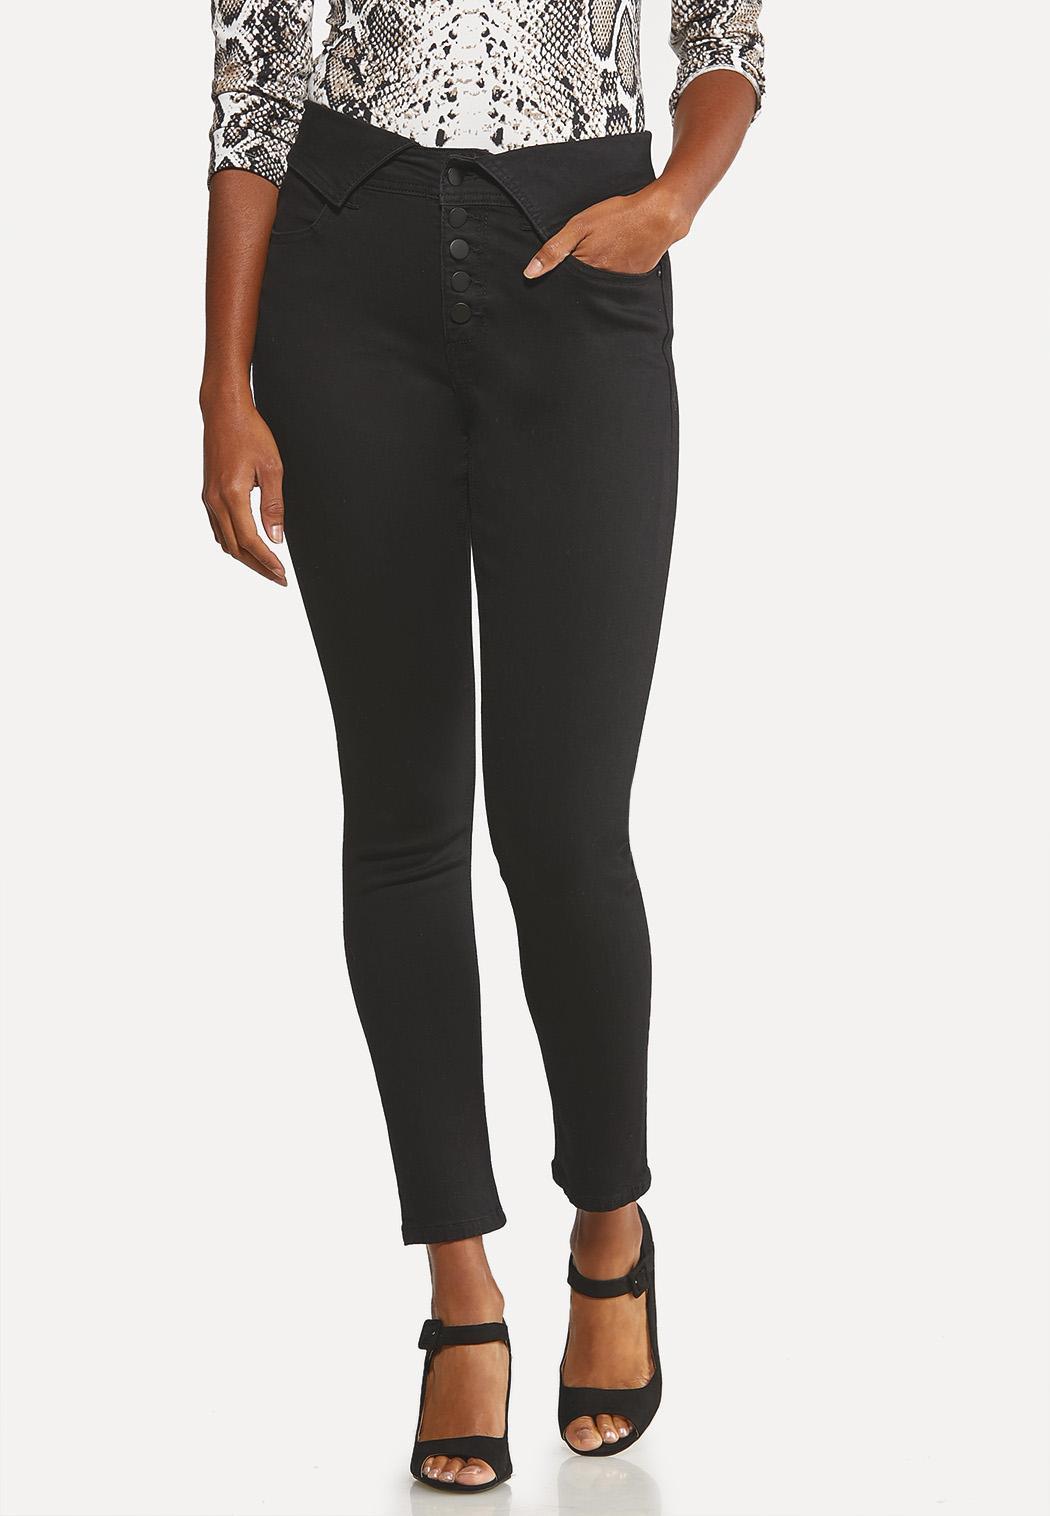 Fold Over Skinny Jeans